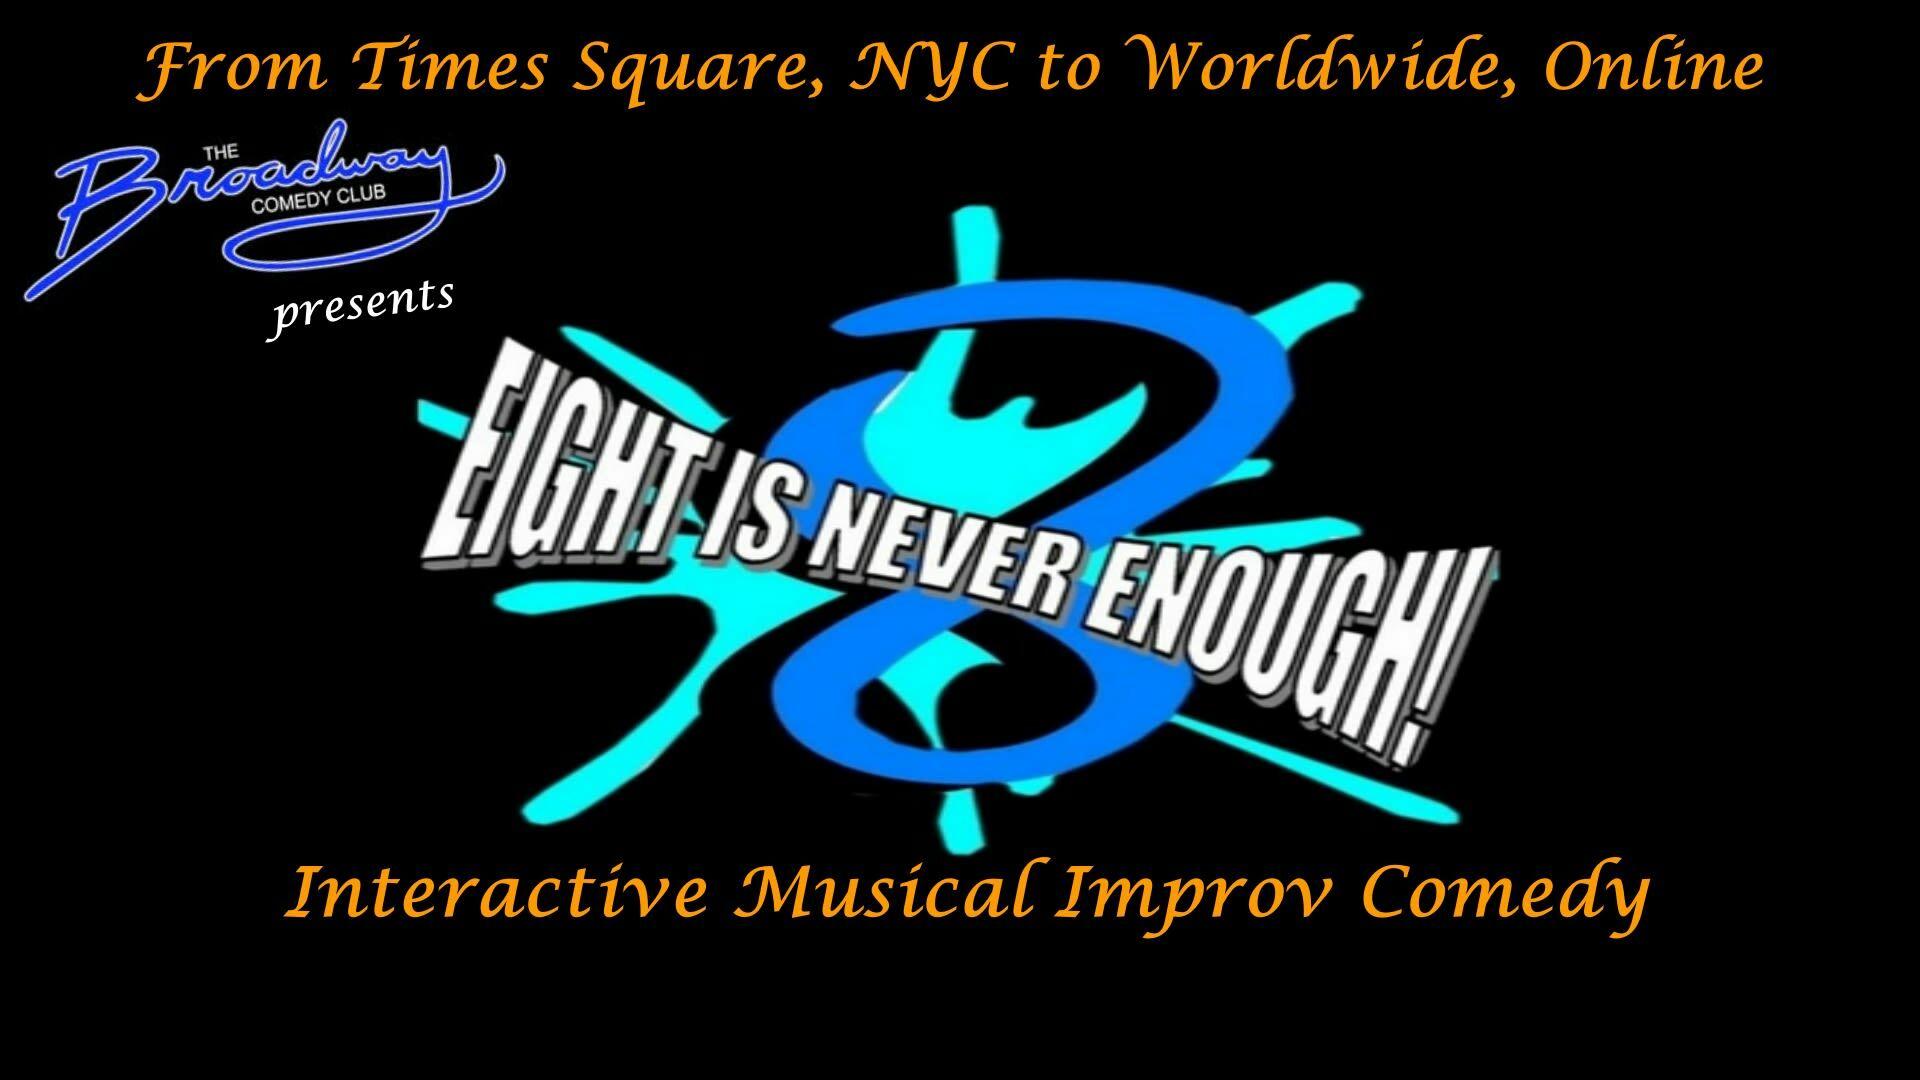 Broadway Comedy Club NYC Presents Interactive Improv Comedy Online